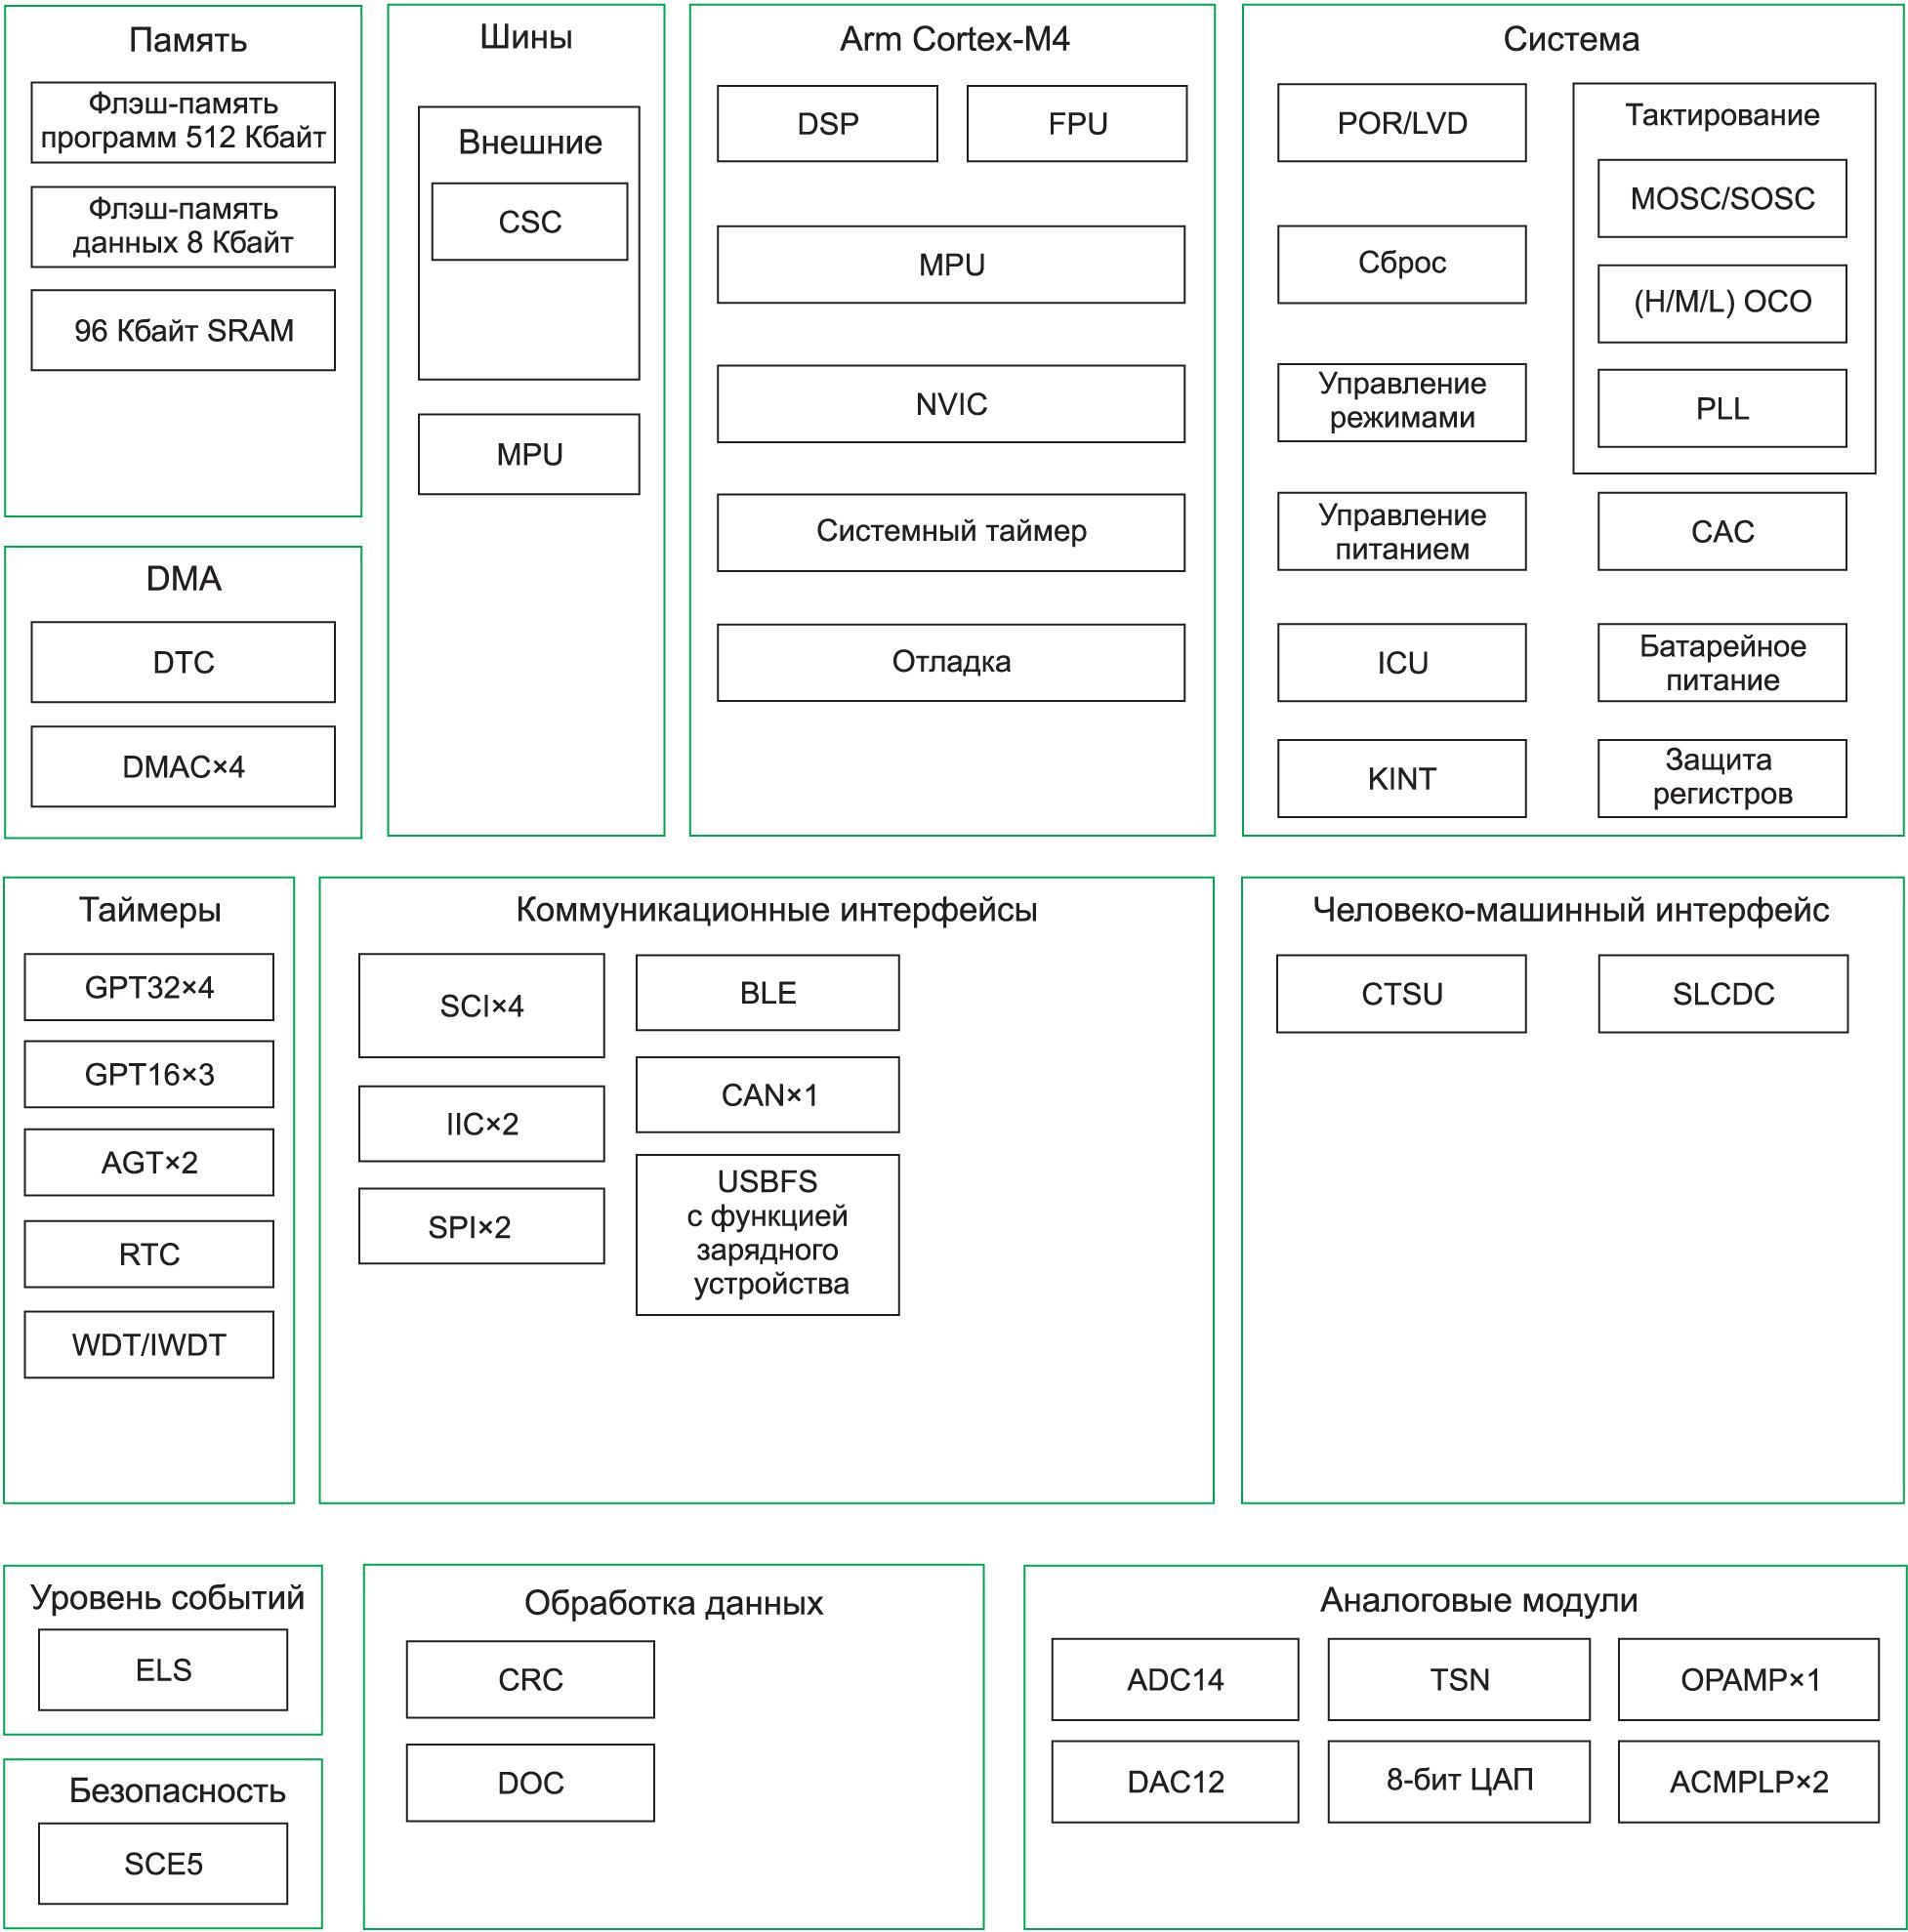 Структурная схема МК RA4W1 компании Renesas